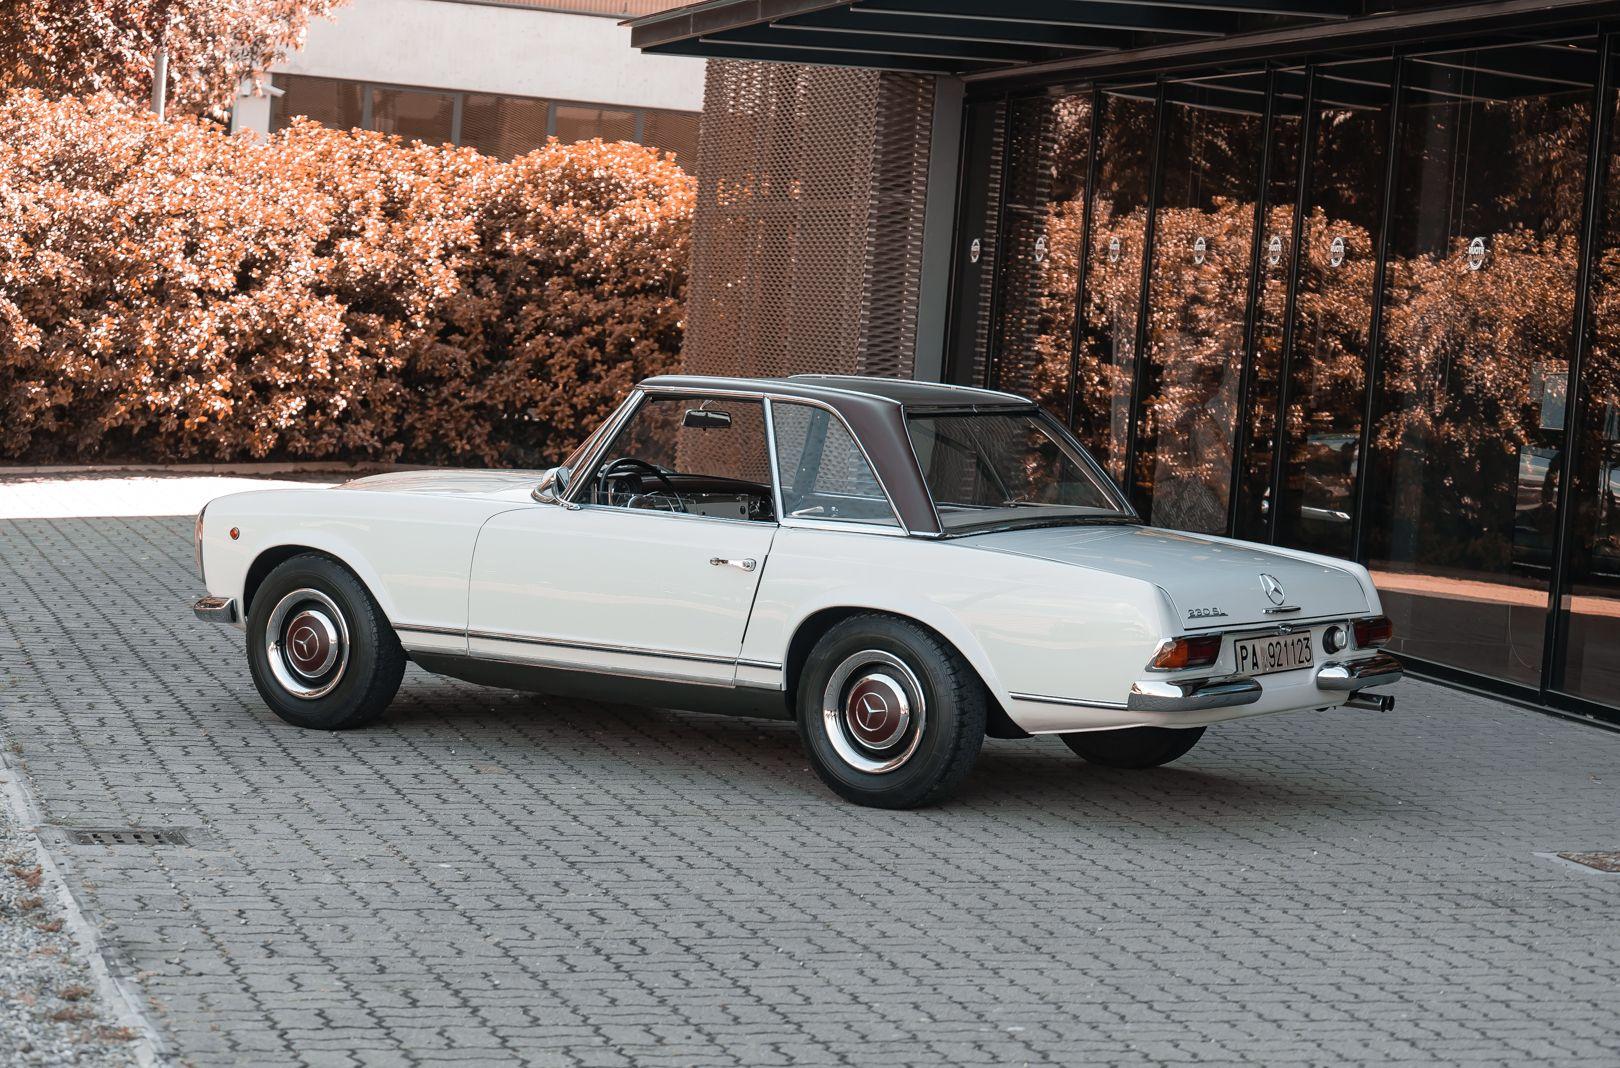 1966 Mercedes Benz SL230 Pagoda 76019